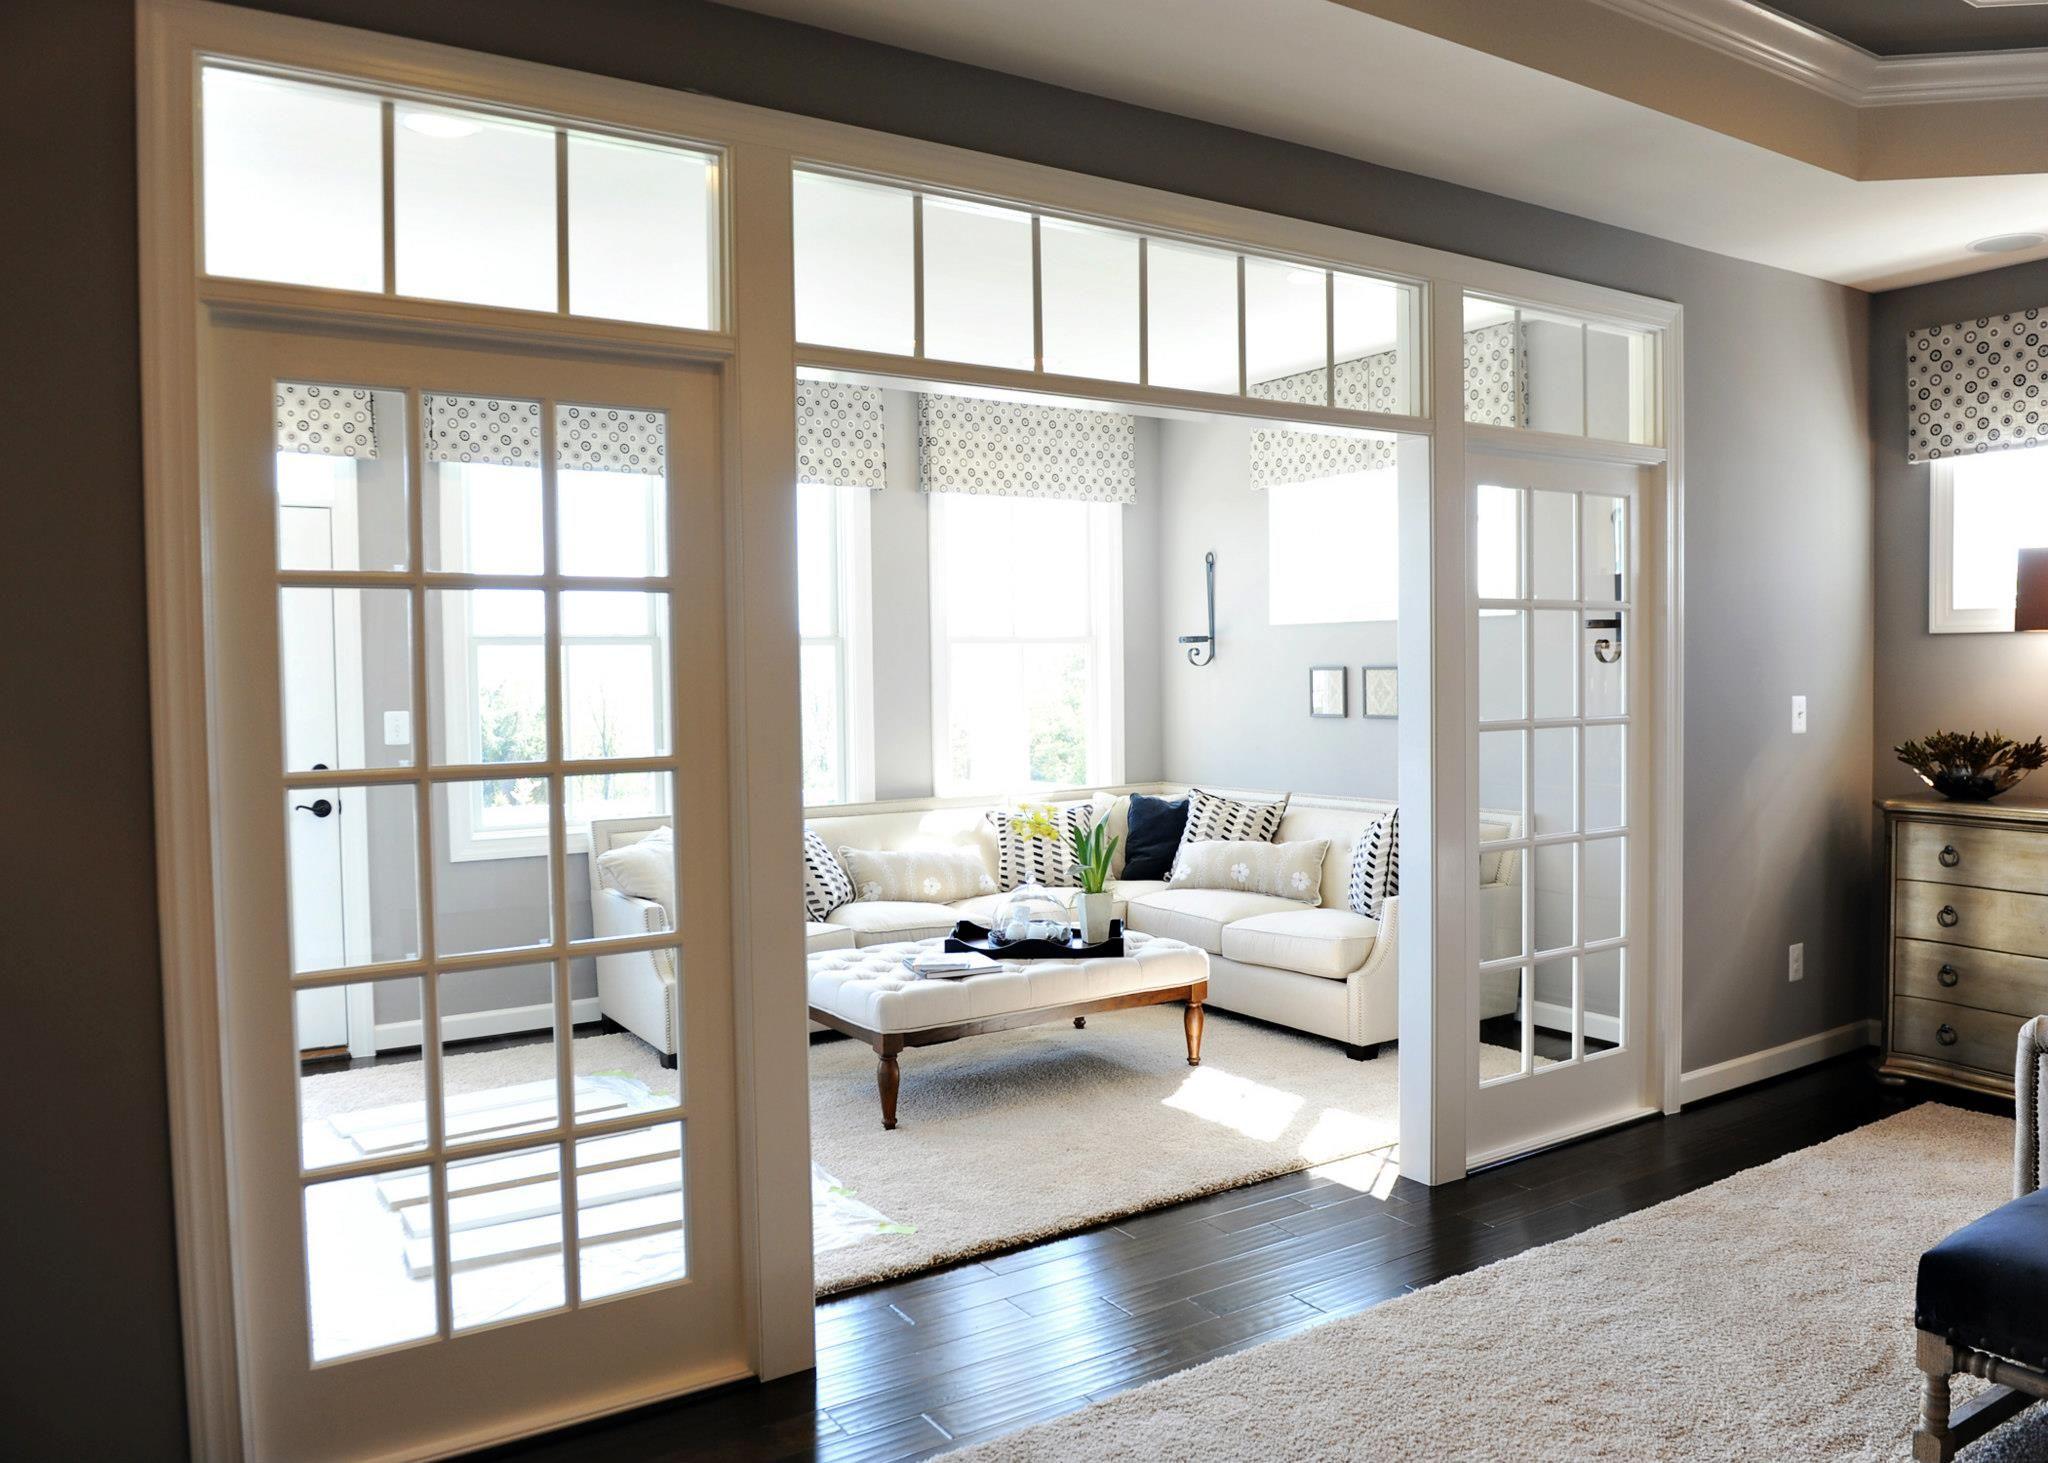 Master bedroom with sitting area - Master Bedroom Sitting Area Master Bedroom Sitting Area My Design Work Portfolio